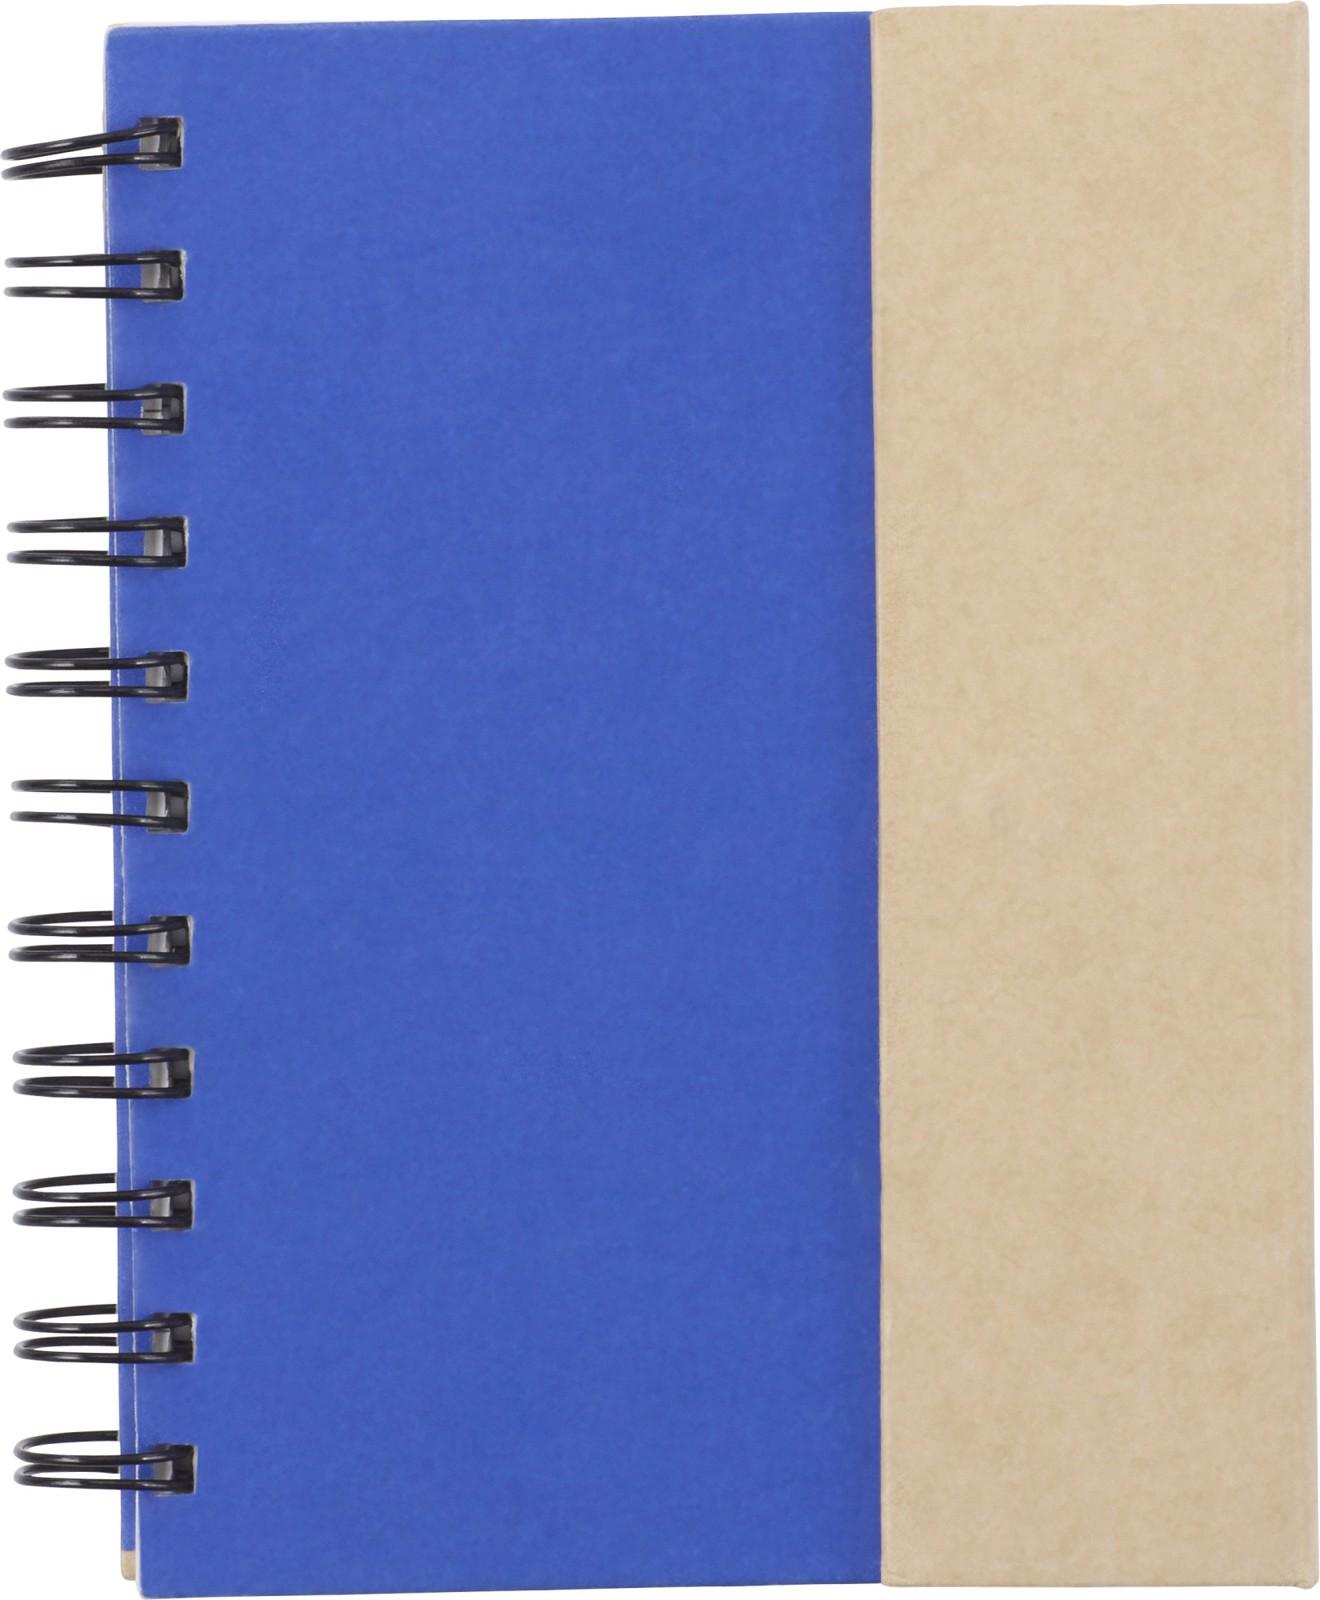 Coardboard notebook - Cobalt Blue